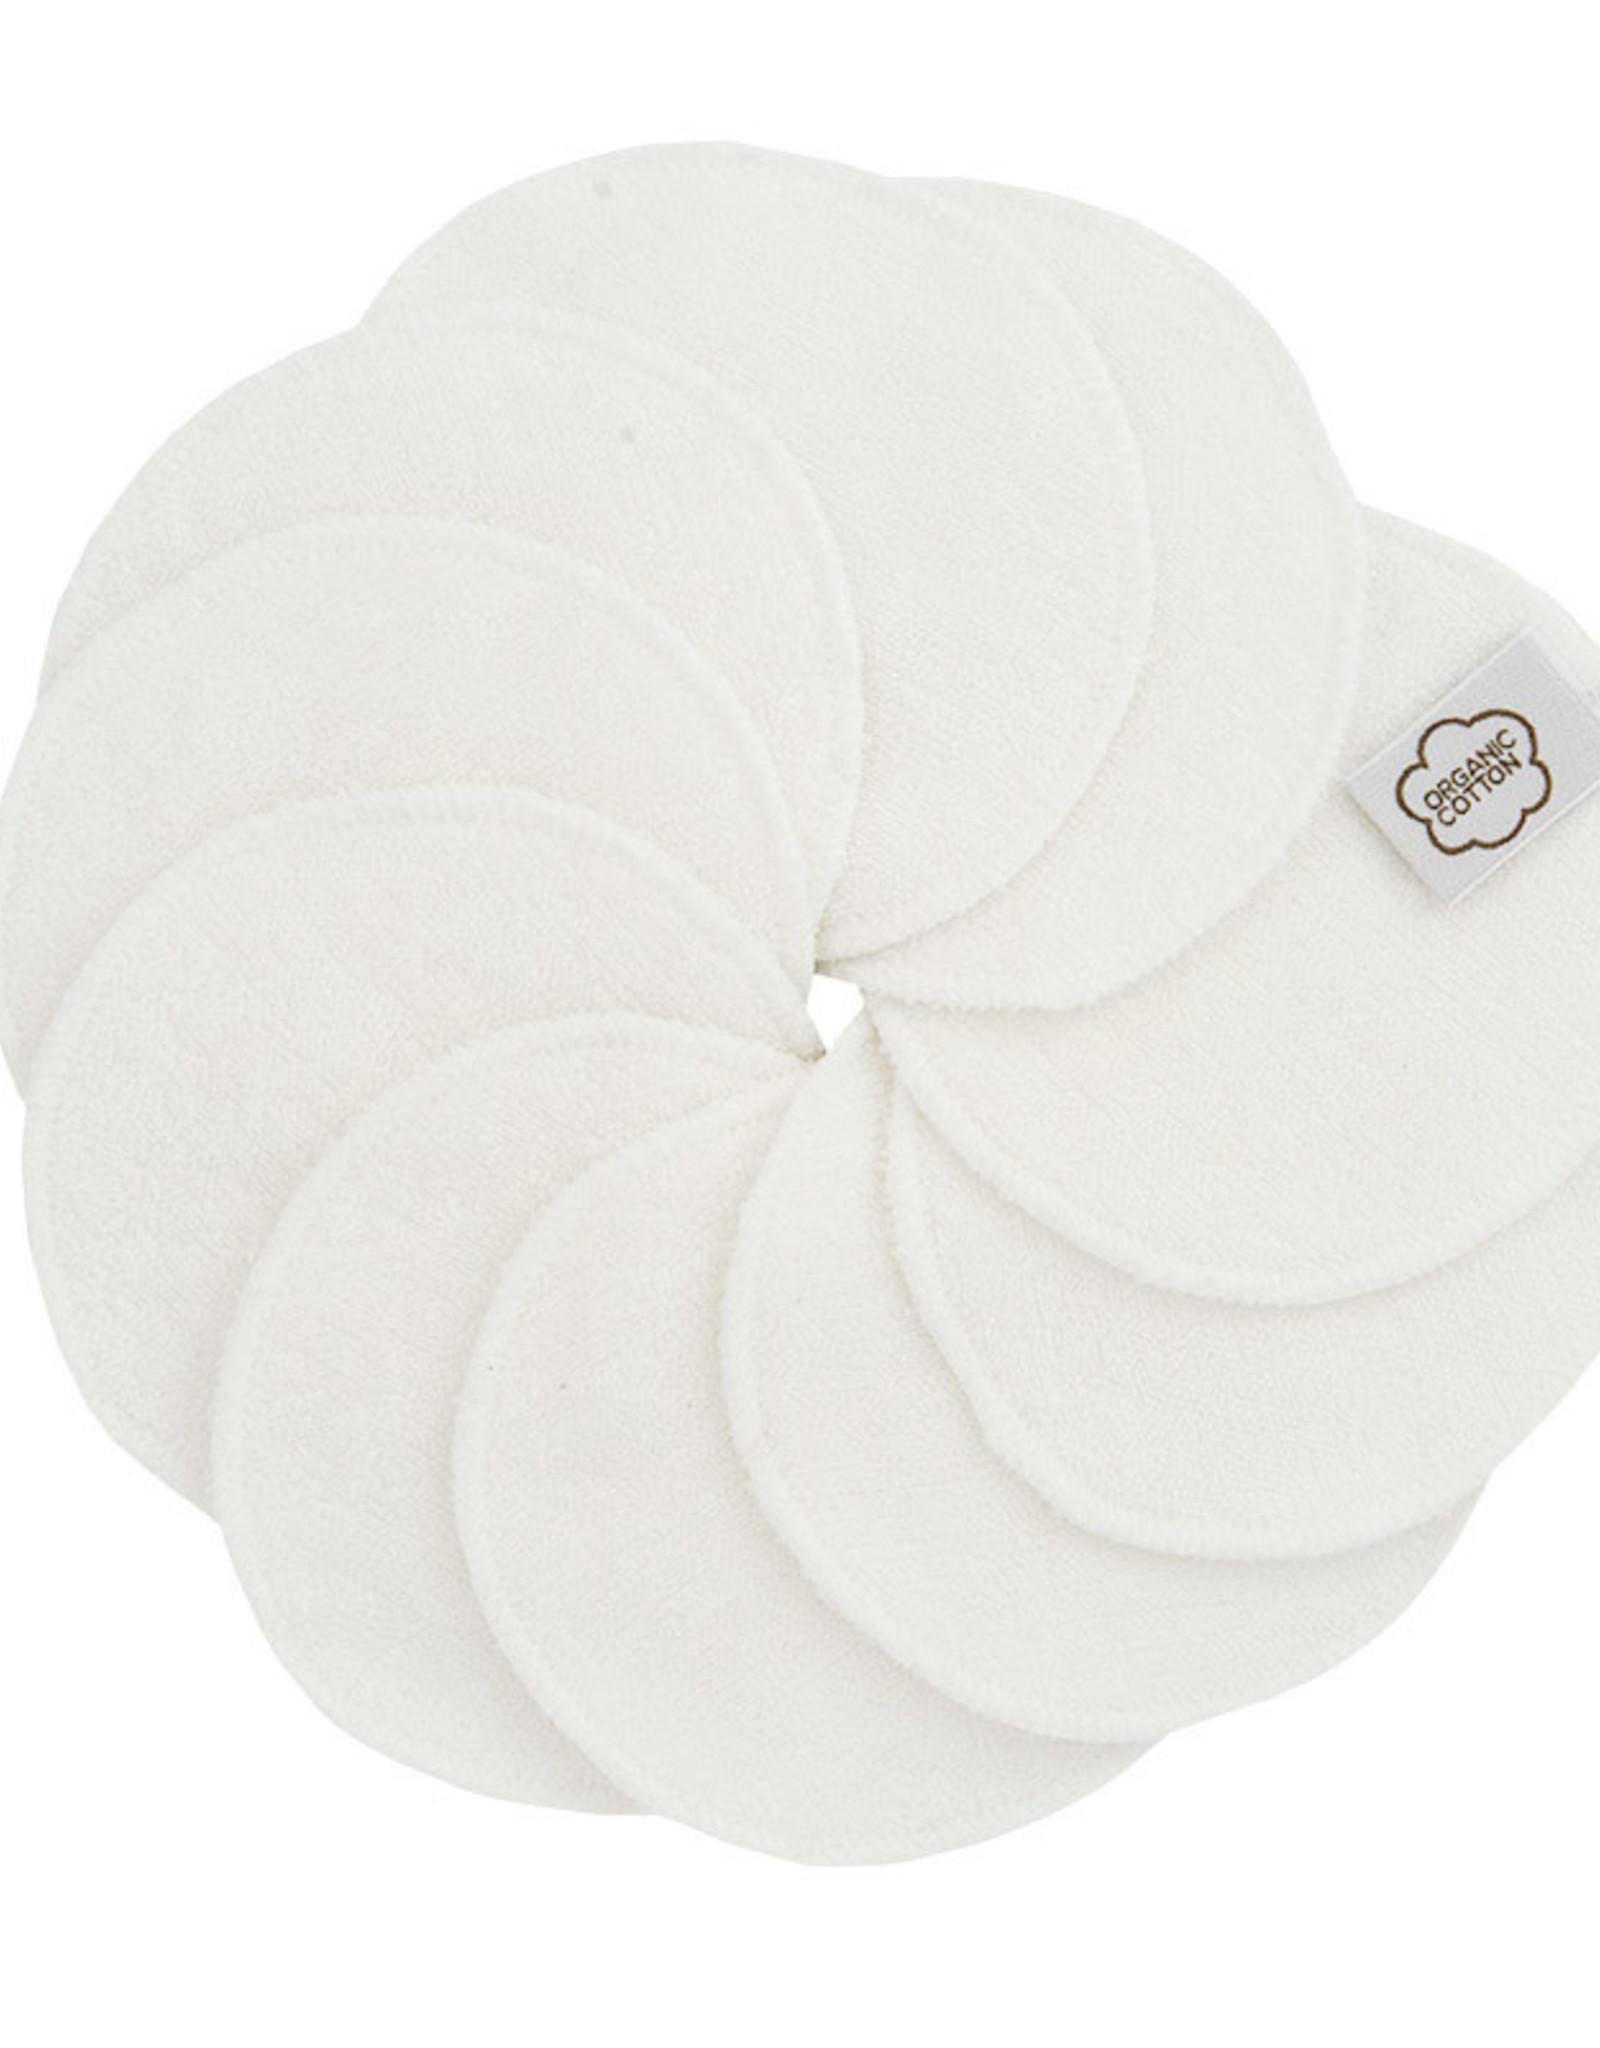 ImseVimse Cleansing pads, 10-pack + washbag, White